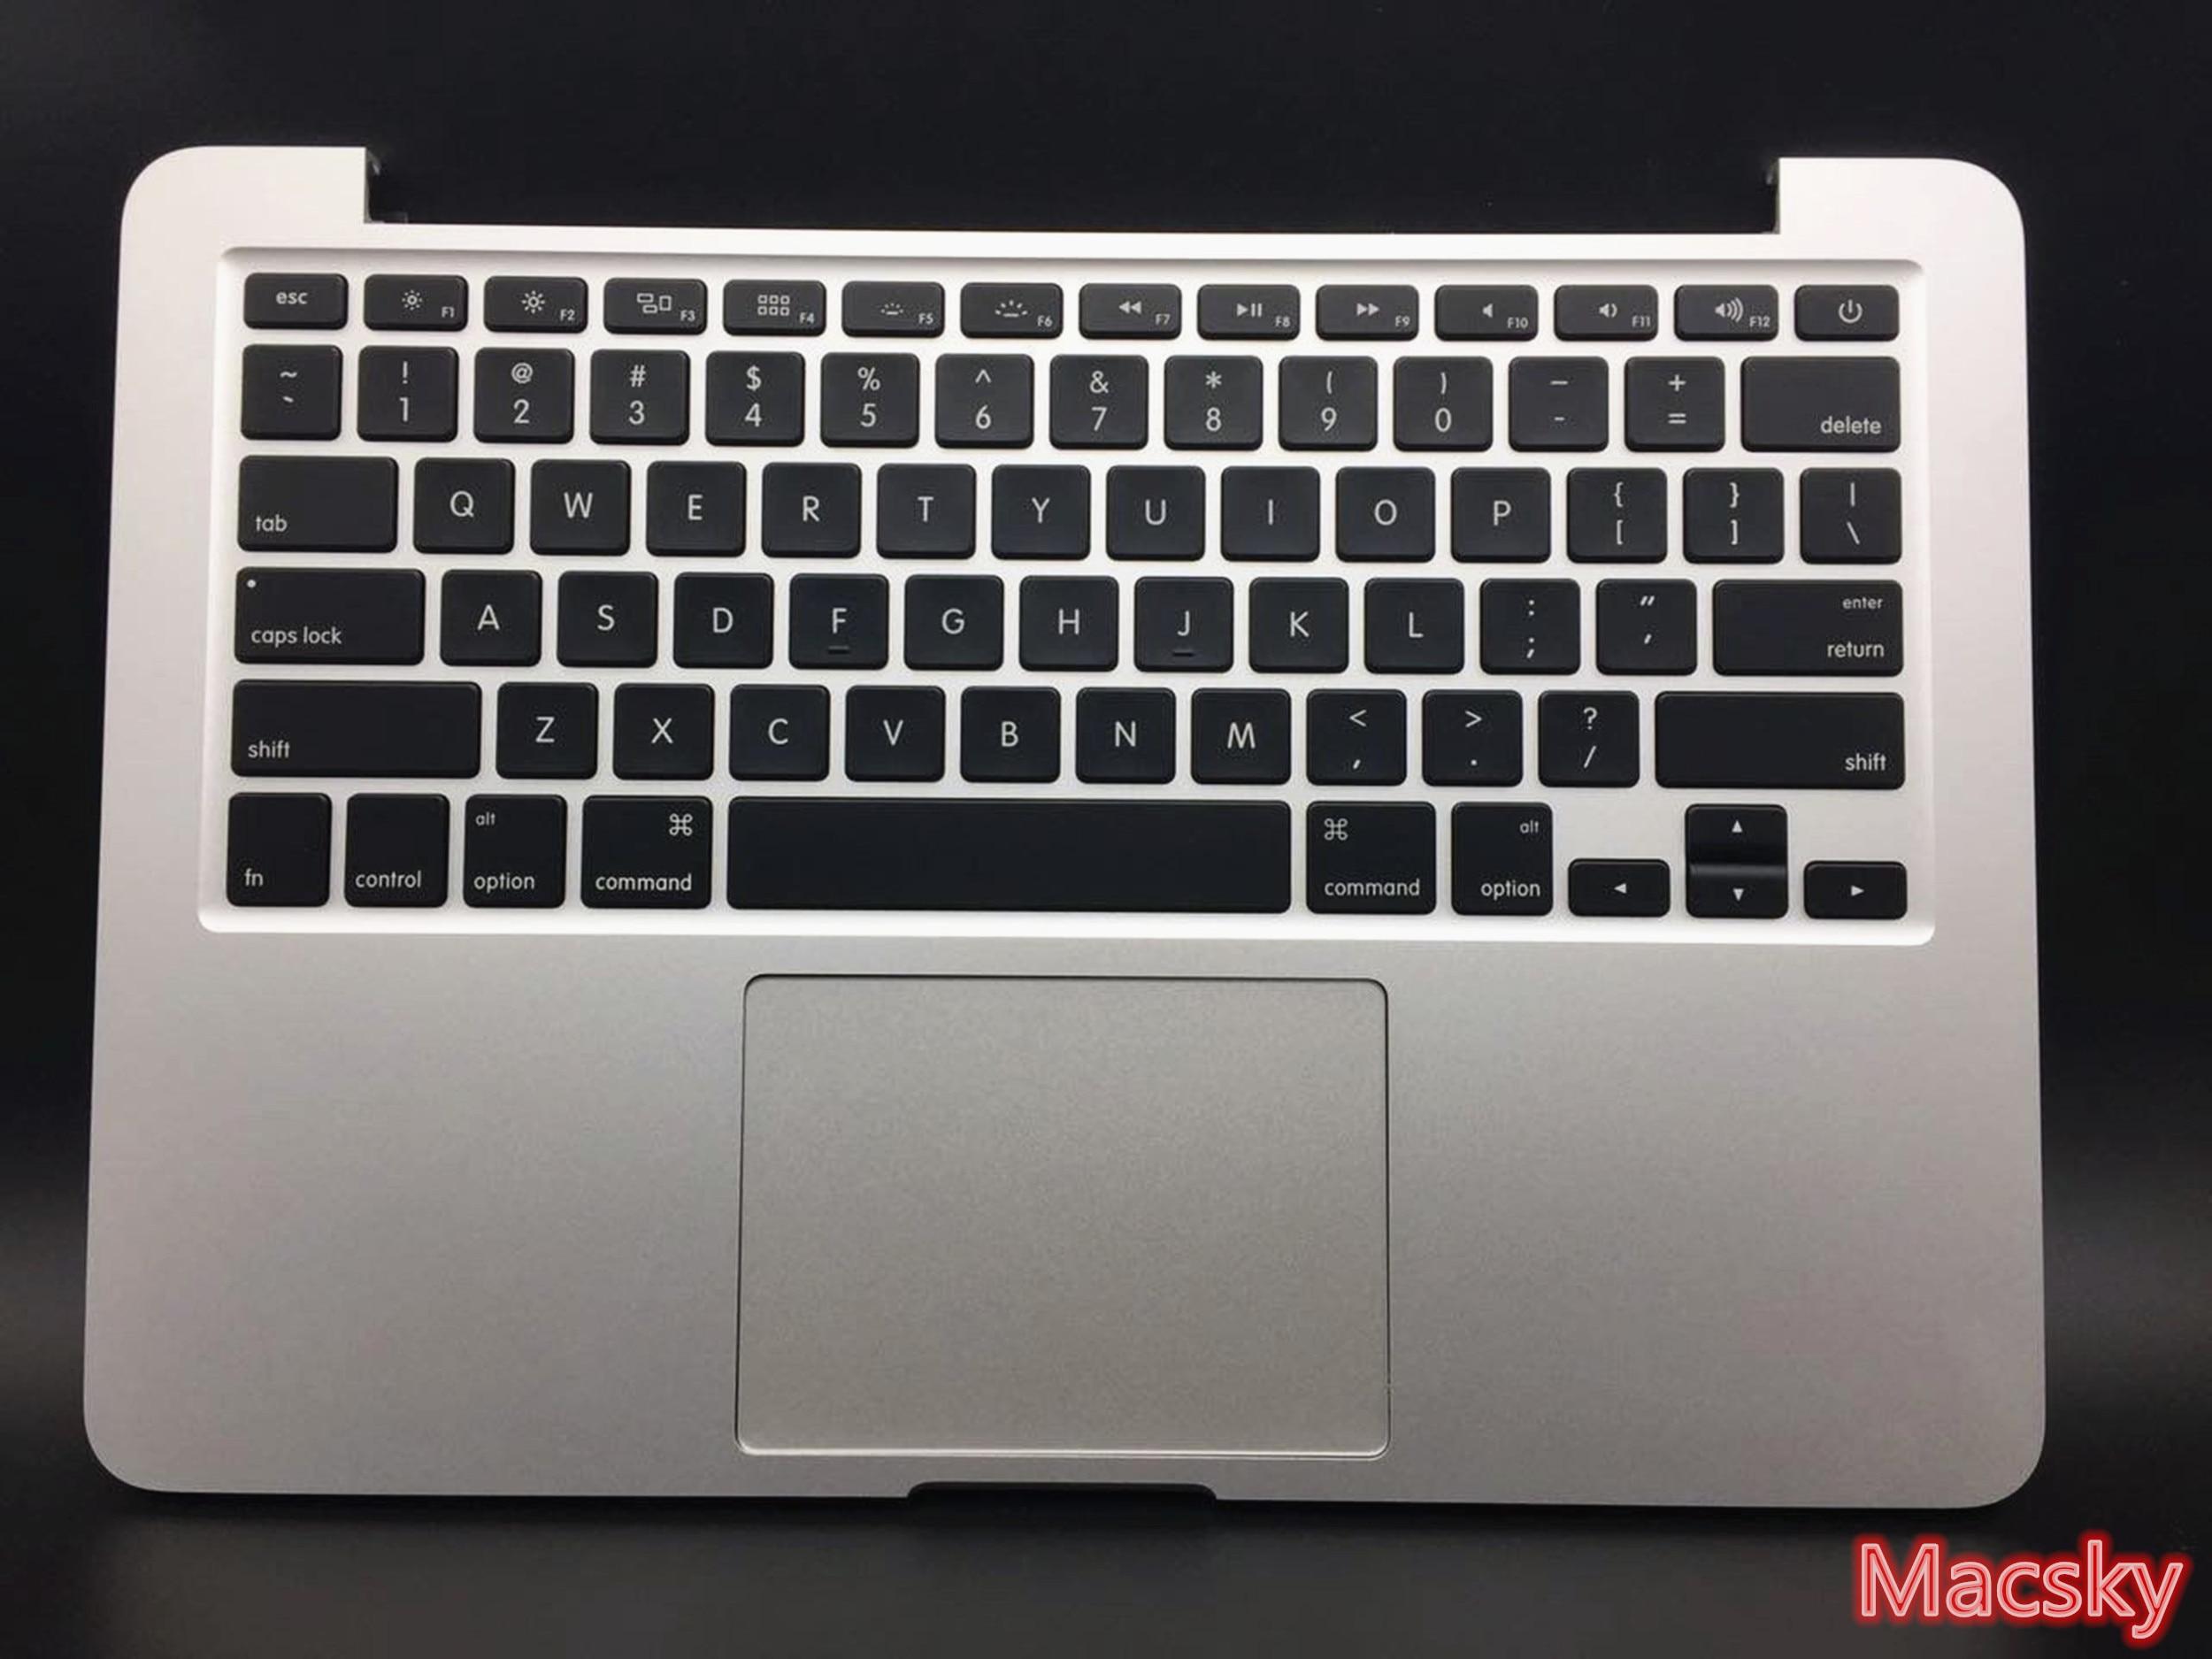 Чехол New Top Для Macbook Pro retina 13,3 ''2015 A1502 Подставка для рук с нами клавиатура Подсветка трекпад тачпад Батарея 2015